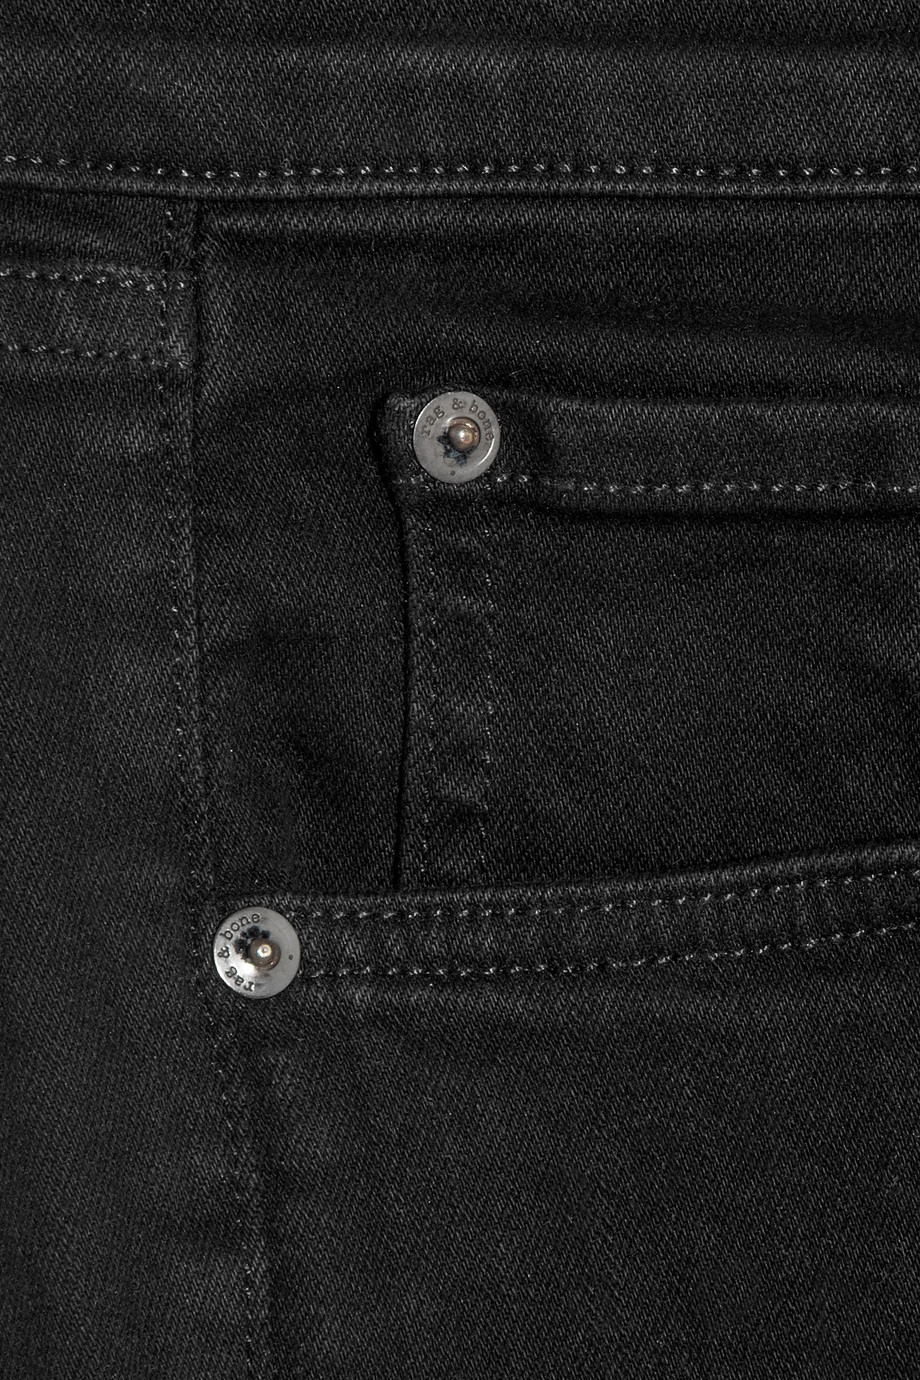 Rag & Bone High-Rise Skinny Jeans in Black